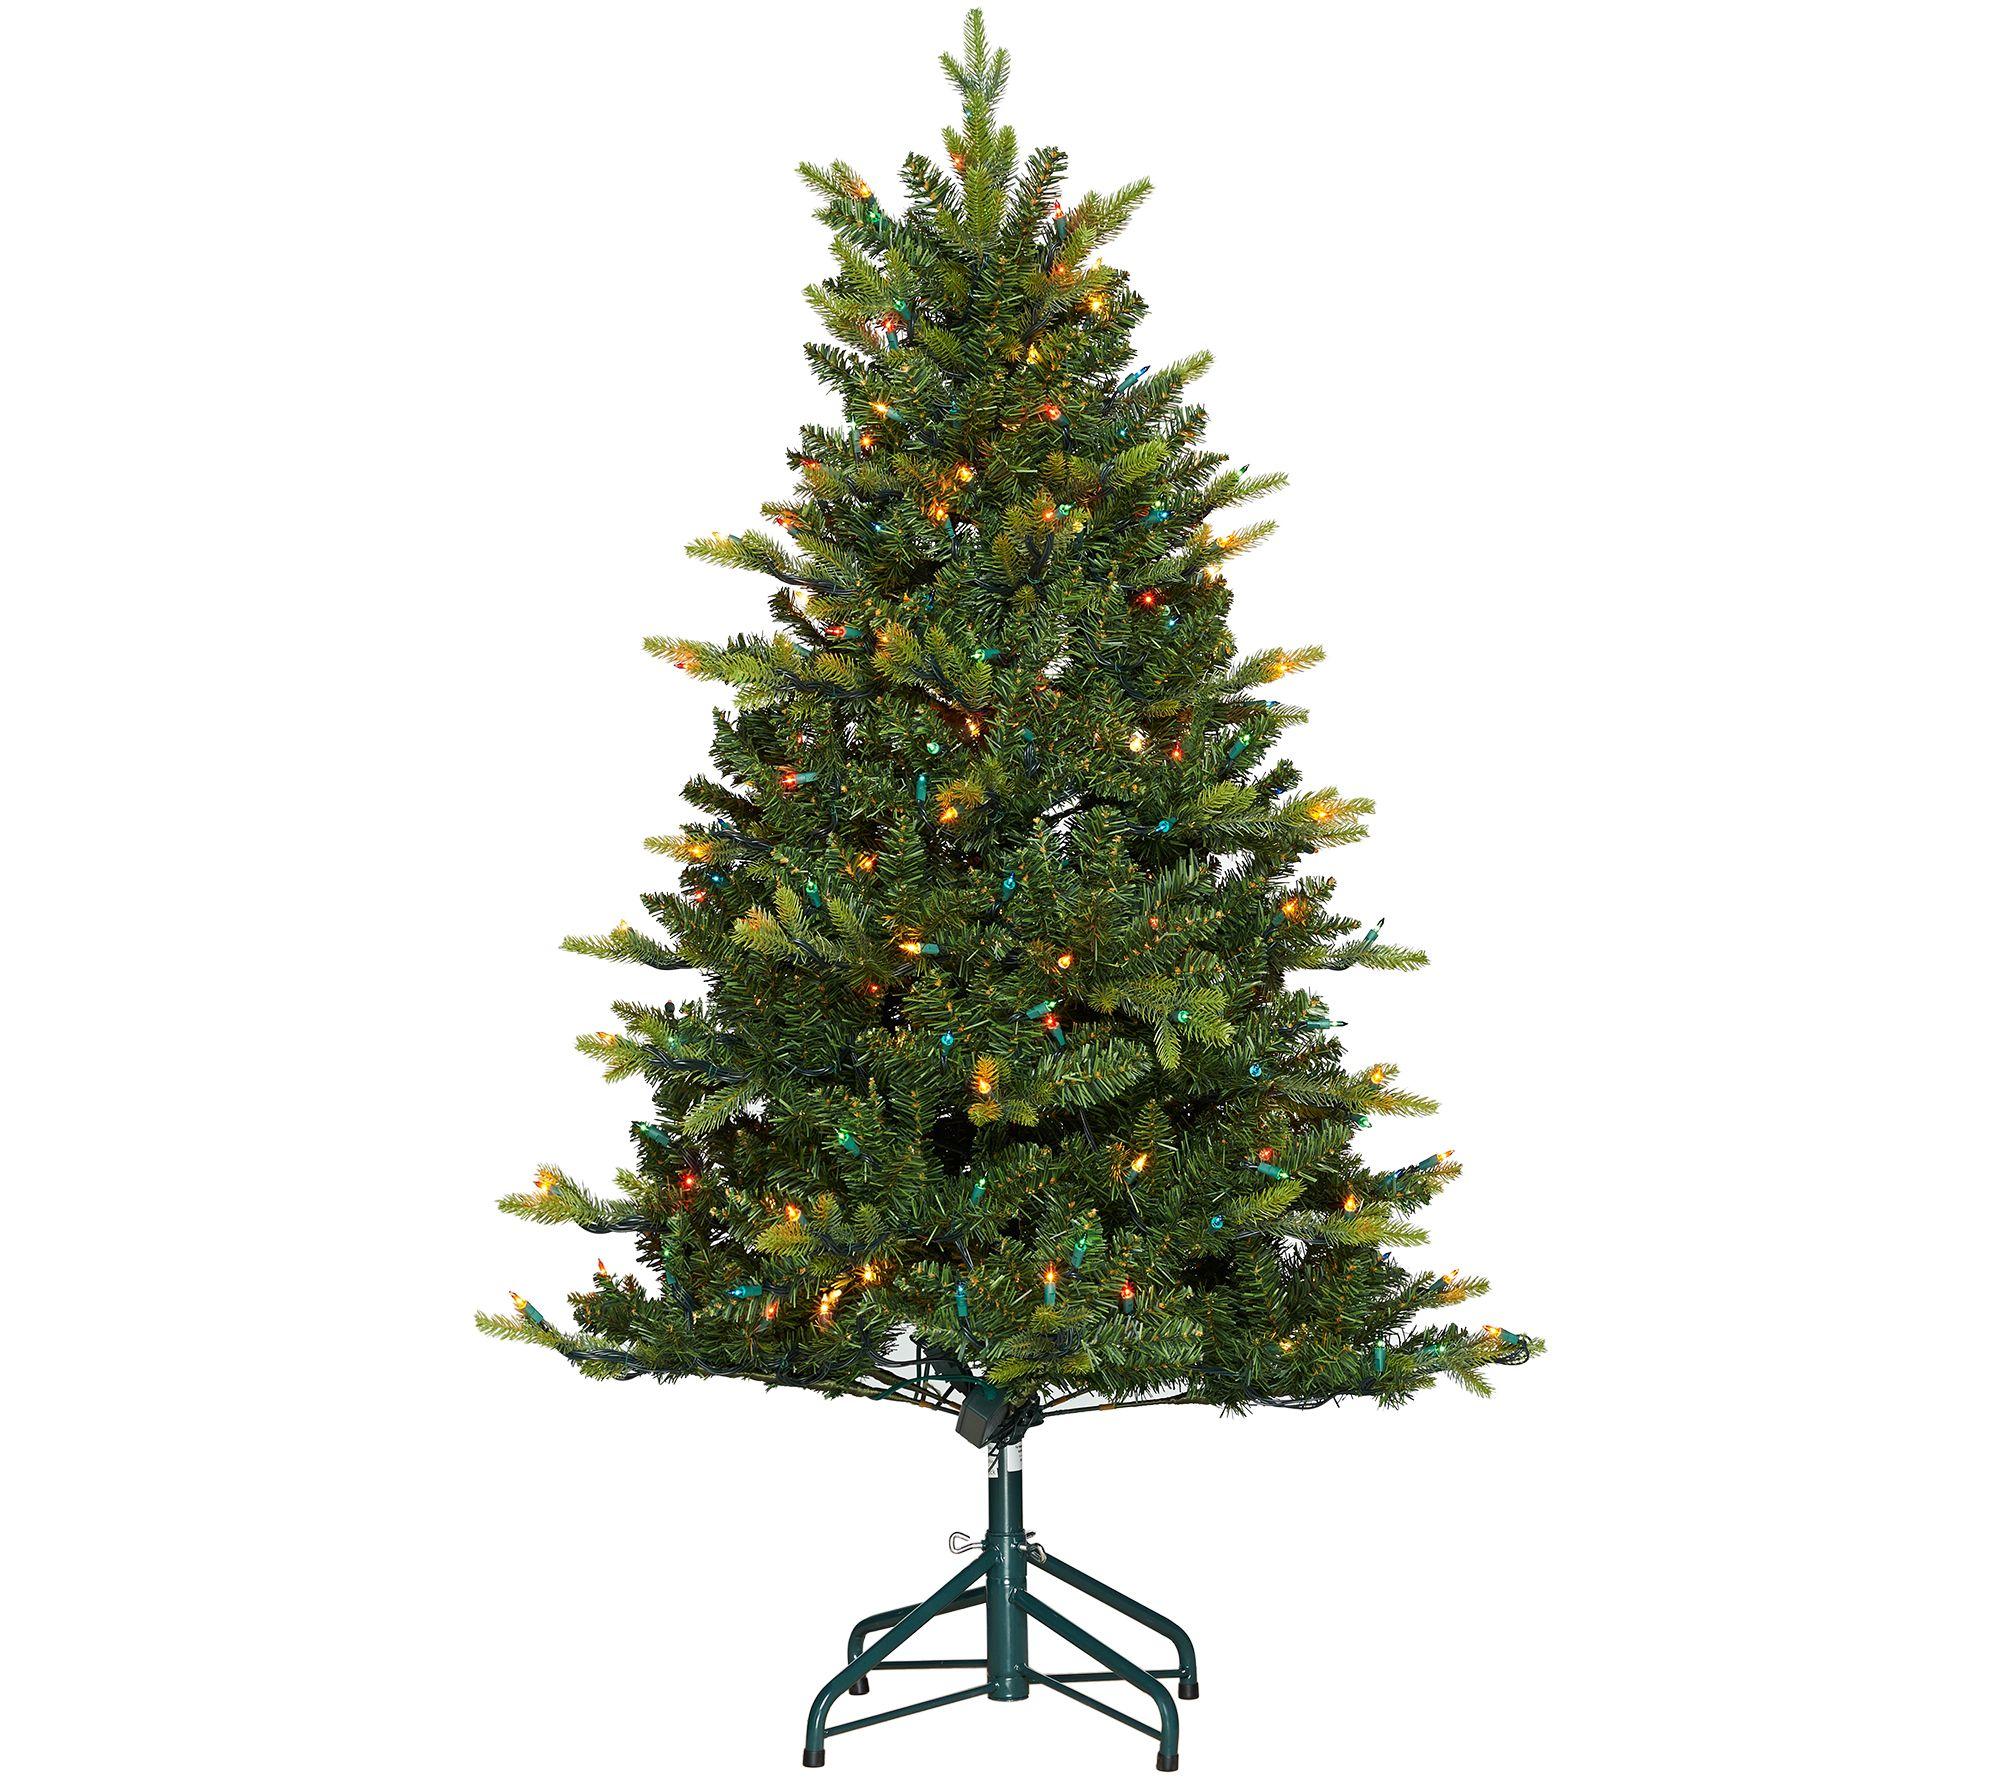 Bethlehem Lights 5' Grand Fir Tree With Swift Lock